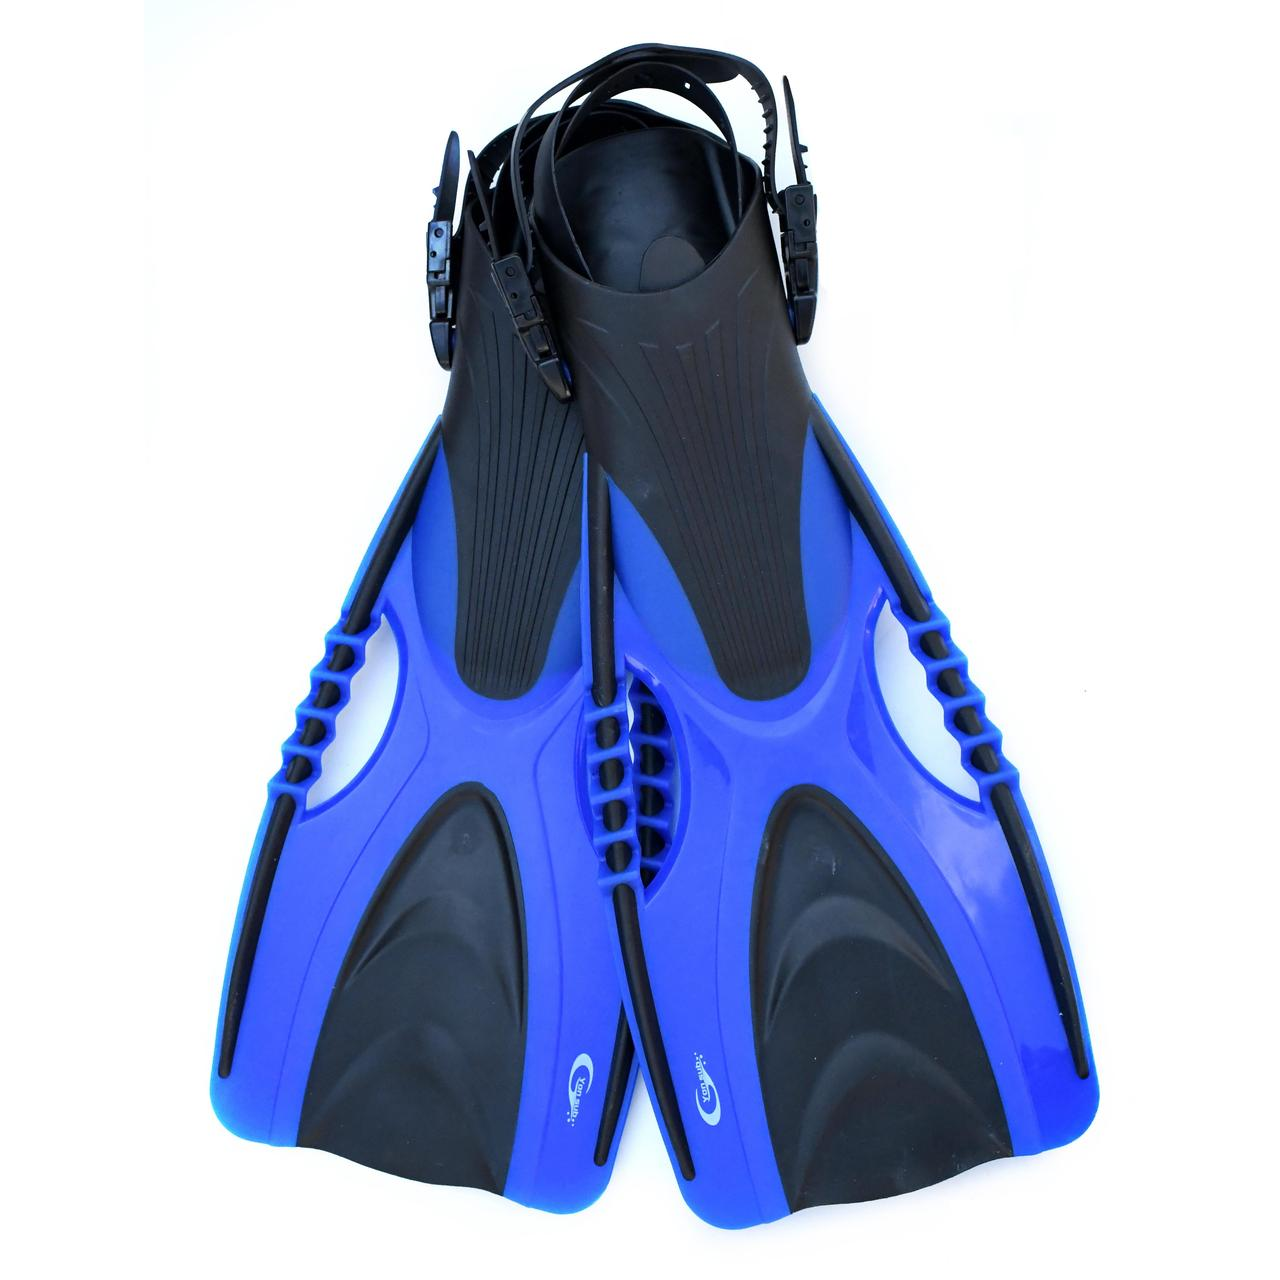 Ласты для плавания YF88 размер S/M (36-40) синие